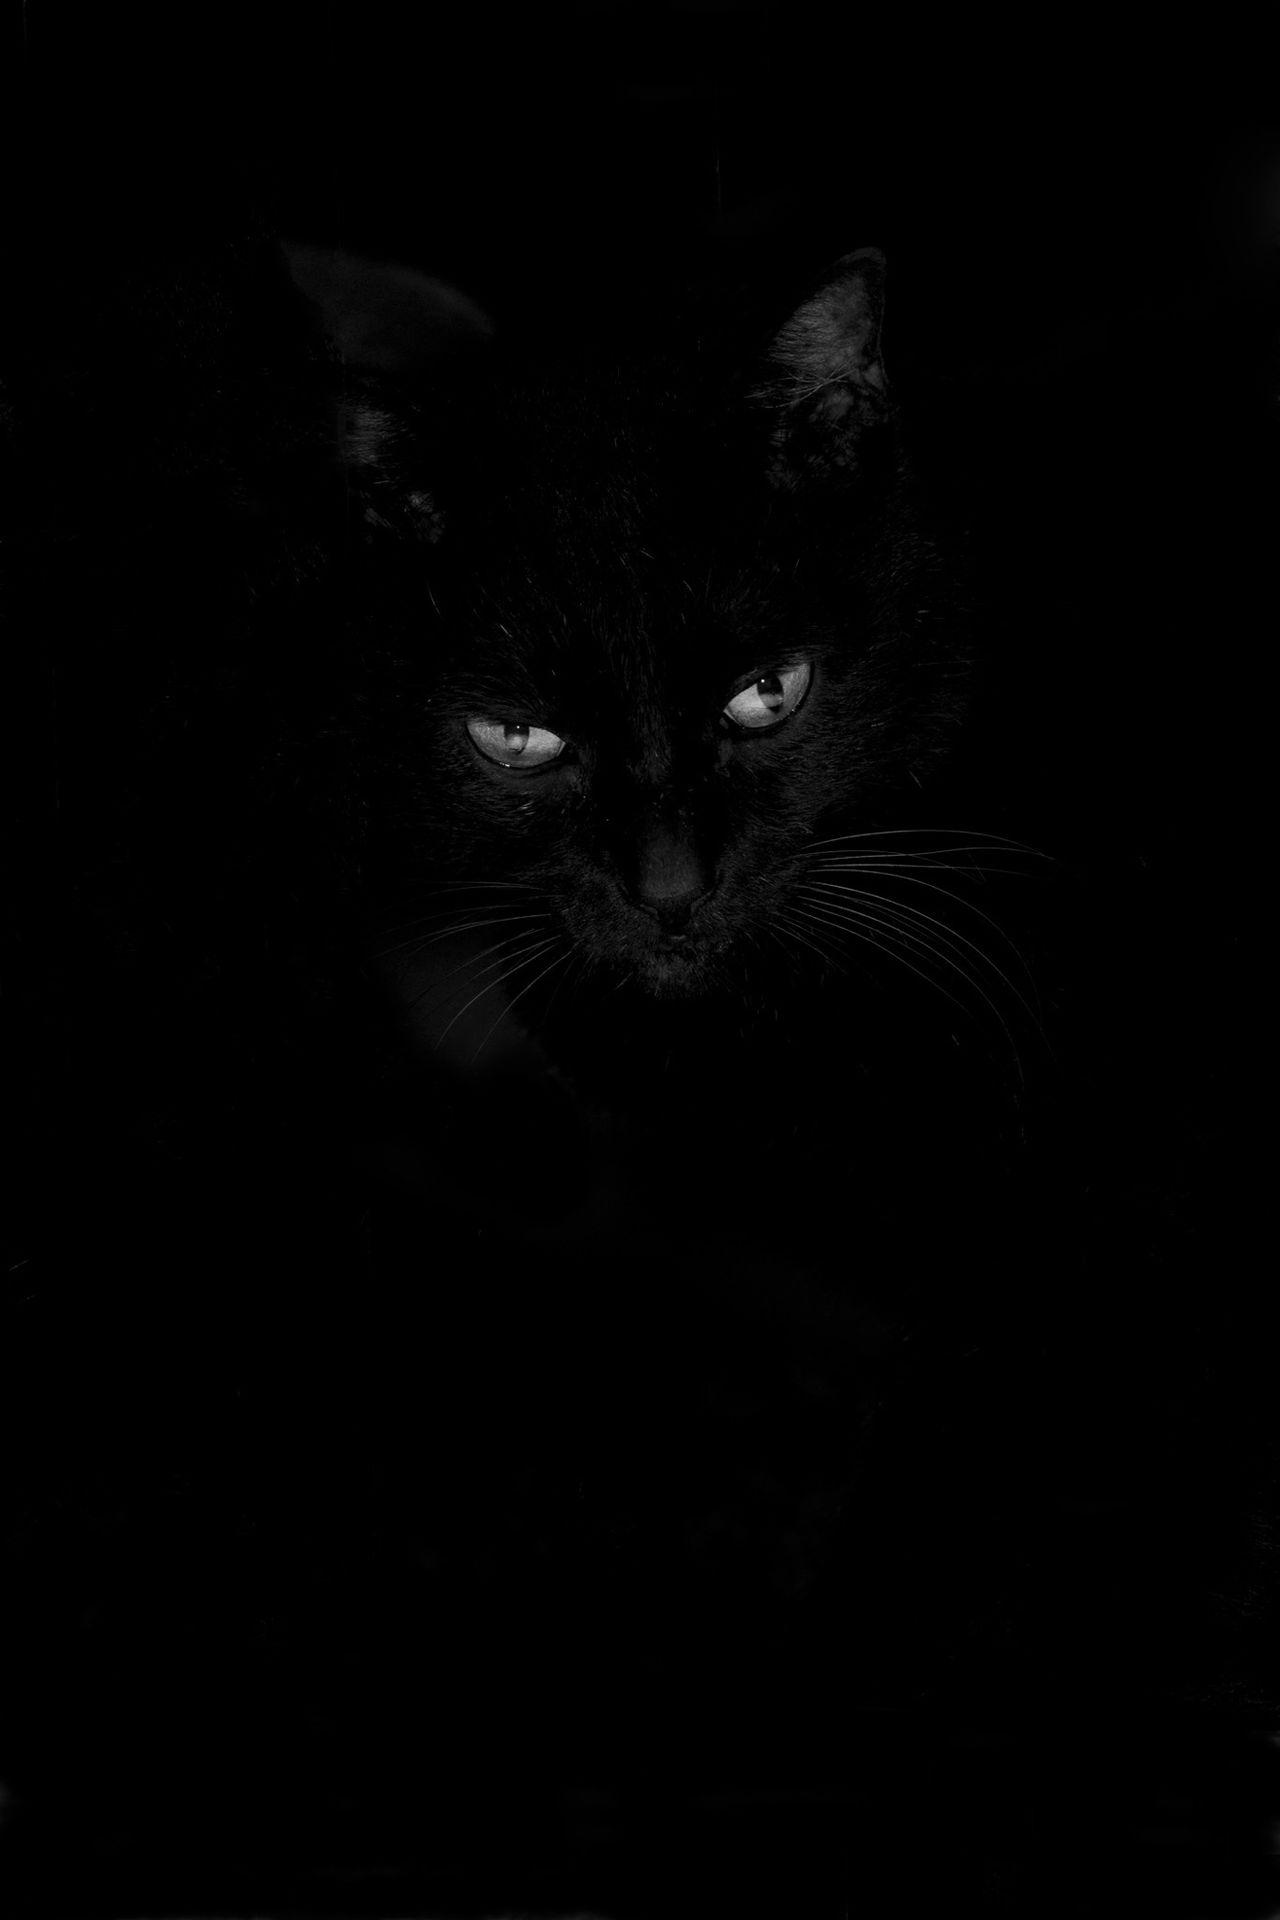 Fairy of night Cat EyeEm Best Shots Black And White Monochrome